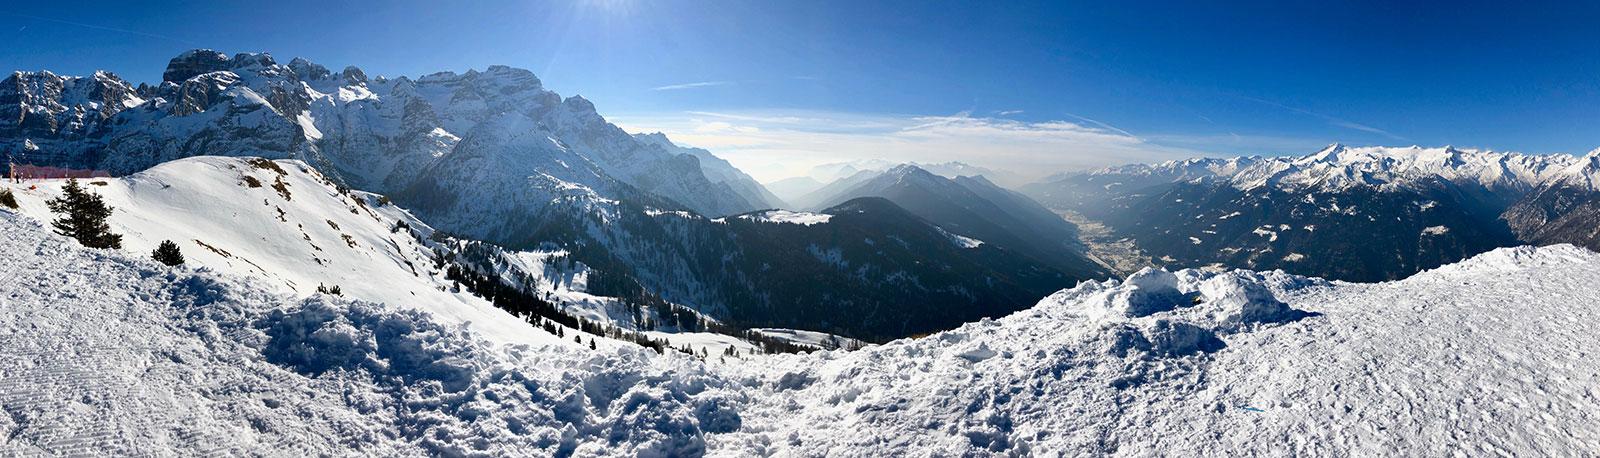 Pinzolo School Ski Trips